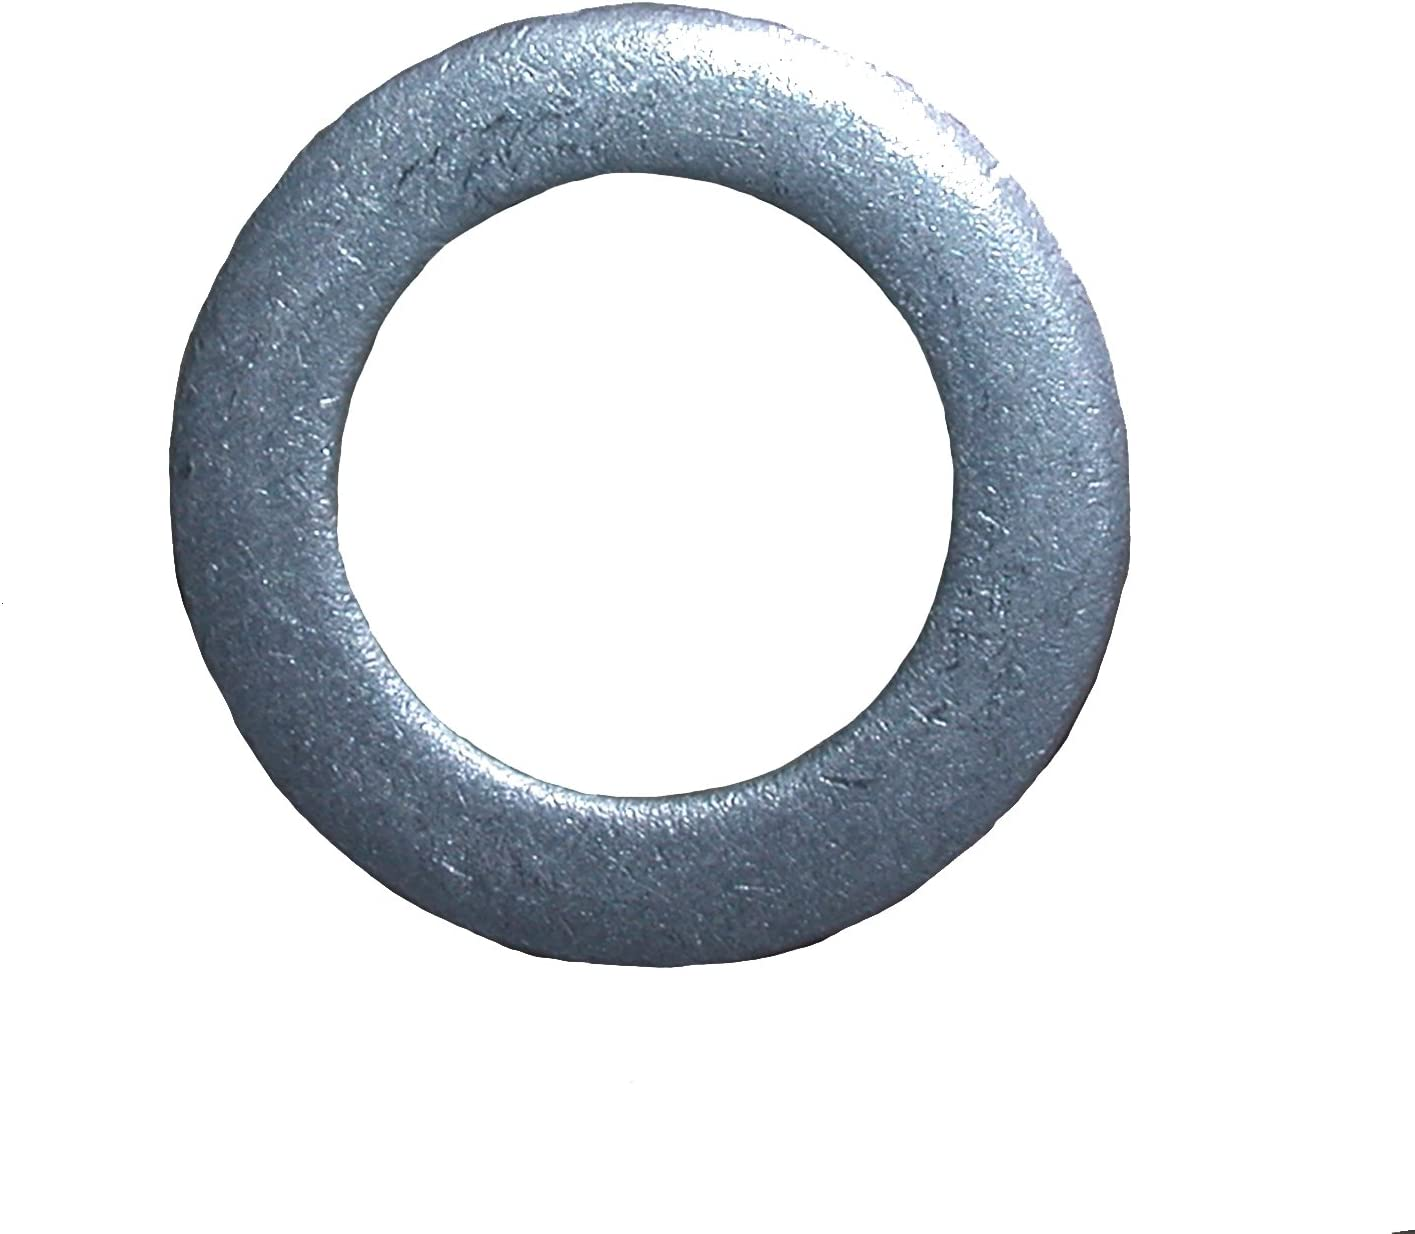 Needa Parts 652166 M14-1.50 Magnetic Oil Drain Plug